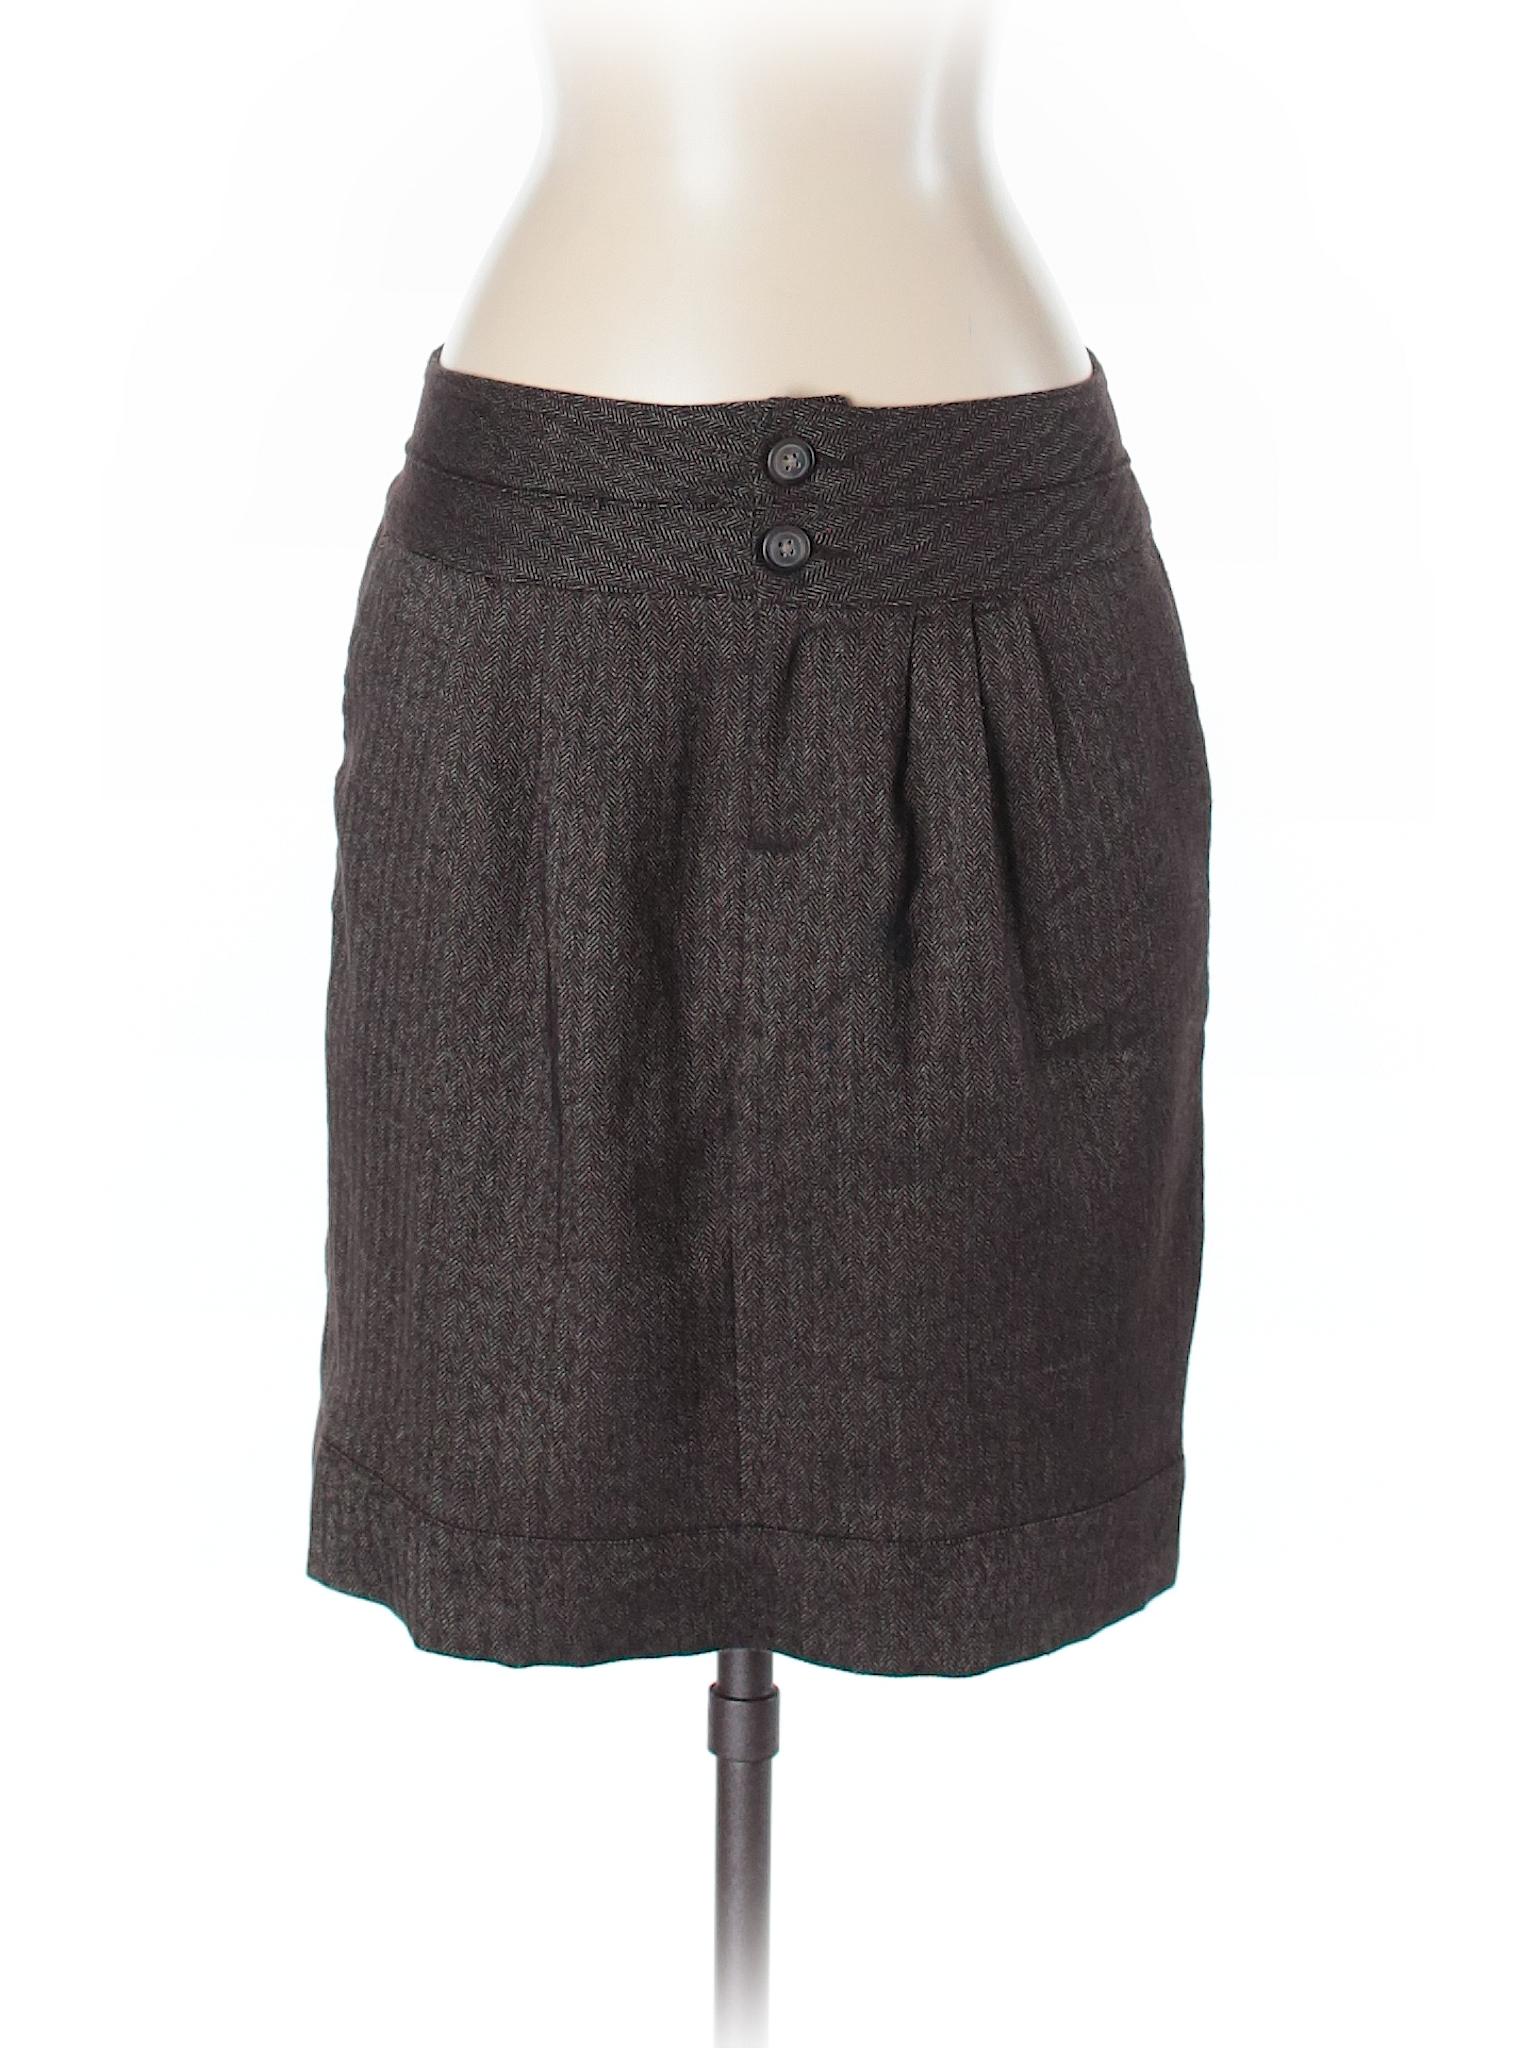 Boutique Boutique Skirt Boutique Skirt Skirt Boutique Casual Casual Casual gWSS74